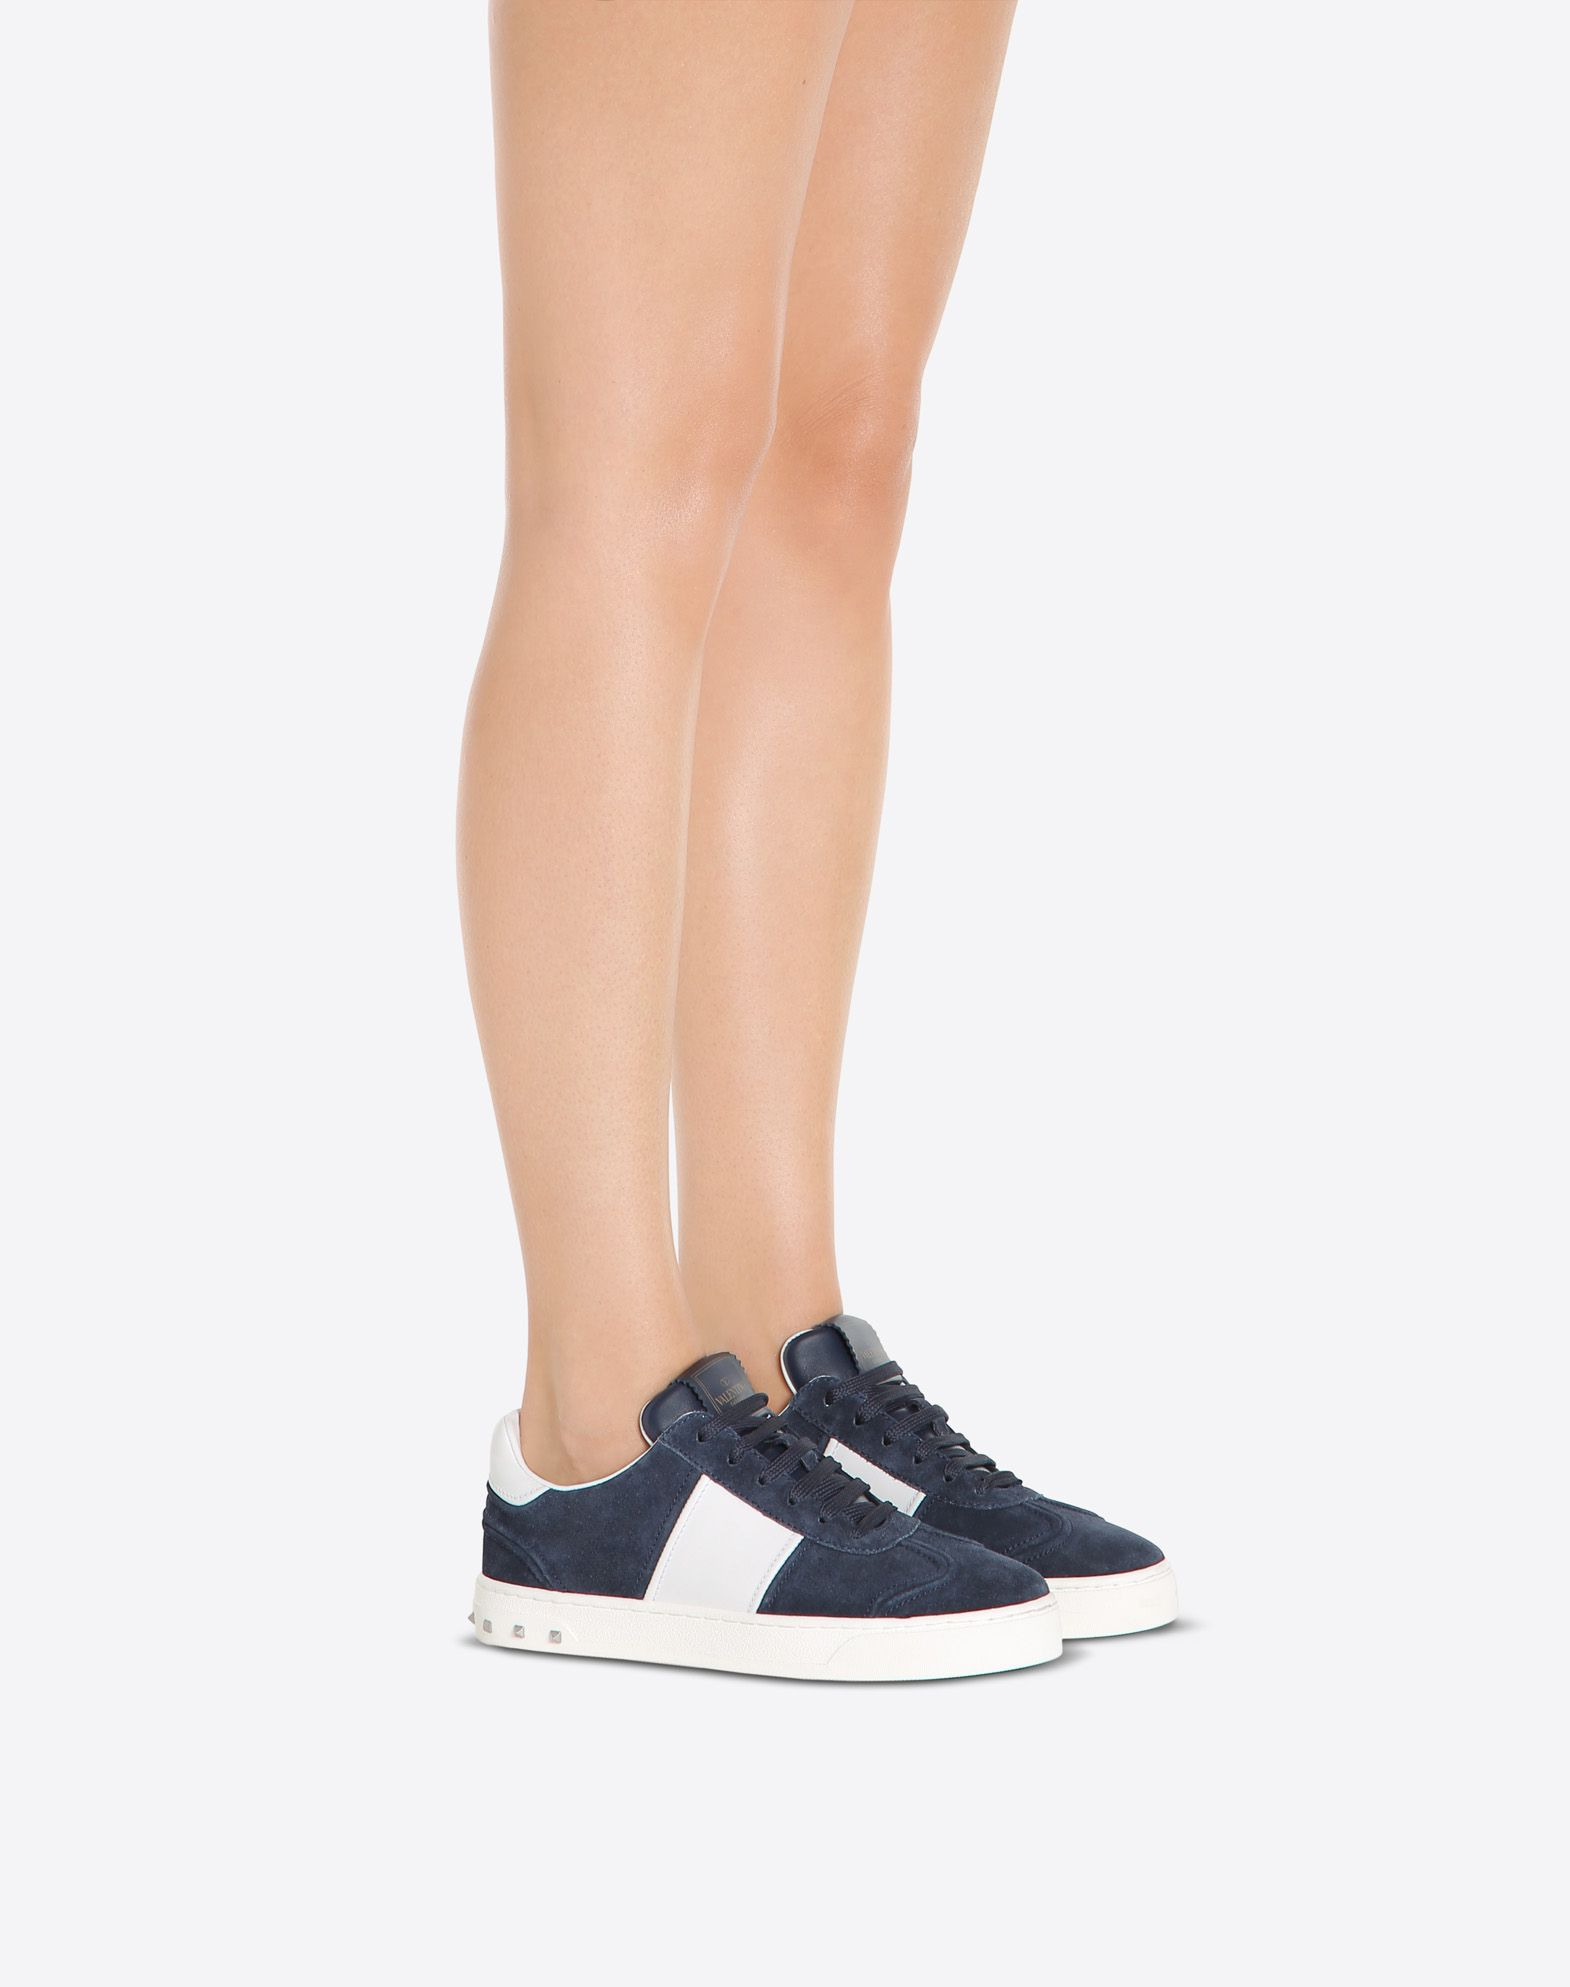 VALENTINO GARAVANI Flycrew Sneaker LOW-TOP SNEAKERS D a